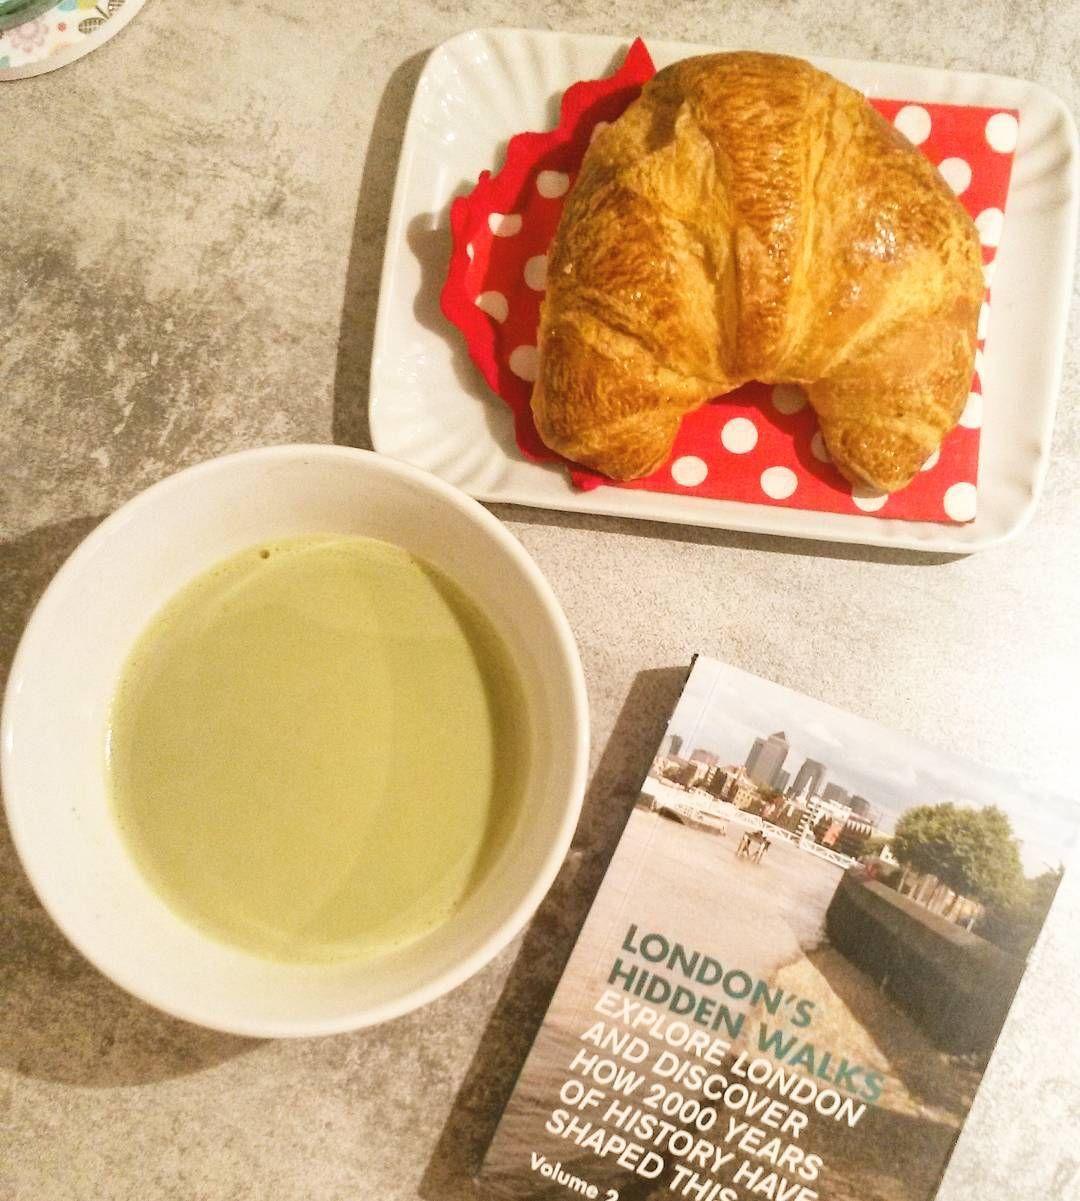 """Serious walks need some proper fuel #matchalatte #green #tea #matcha #livebreakfast #breakfastclub #breakfasttime #petitdej #petitdejeuner#instafood…"""